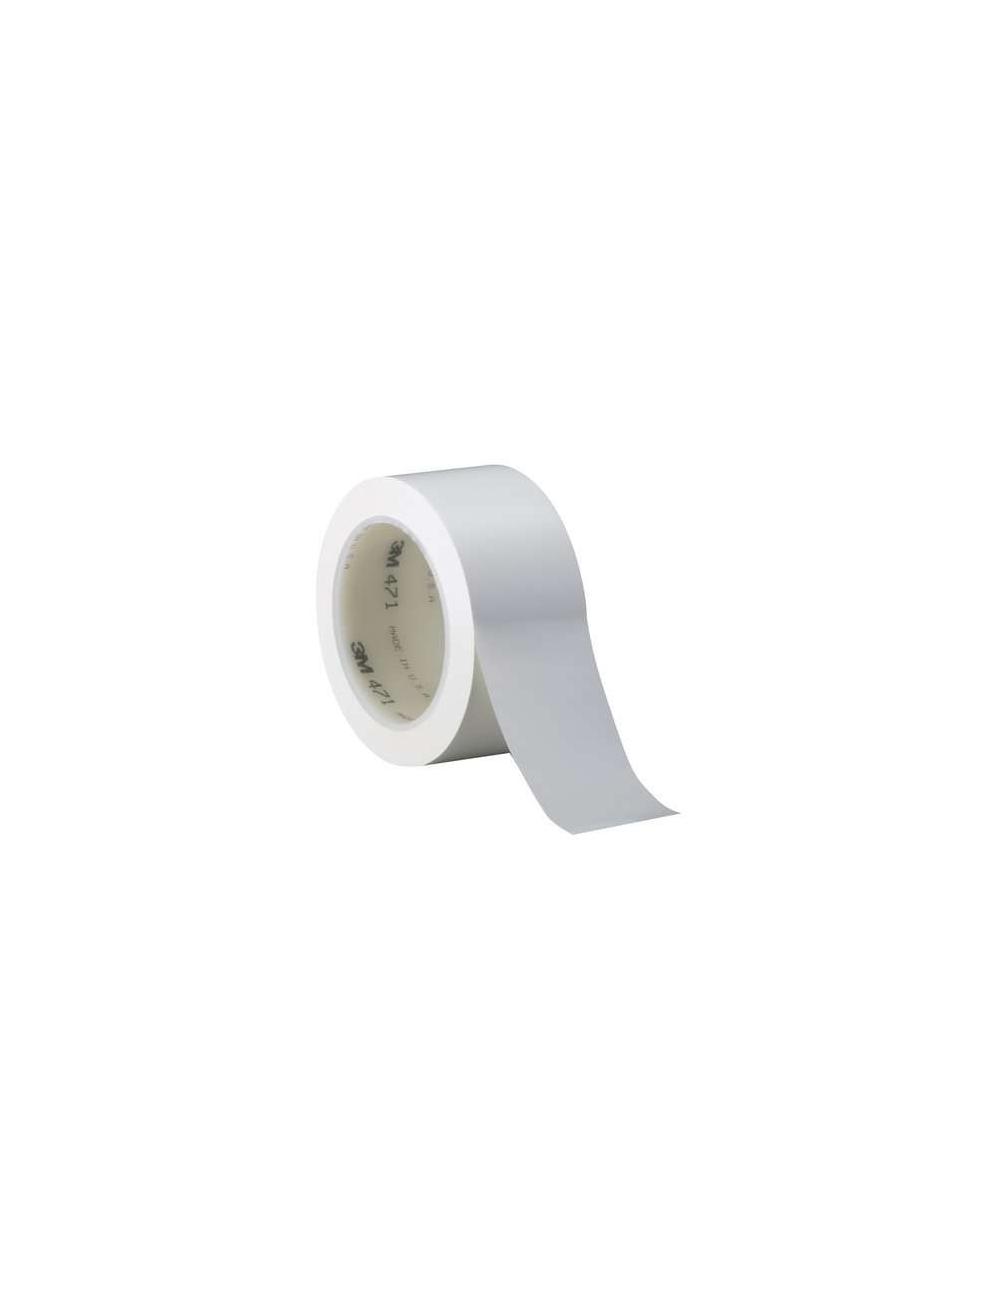 Ruban adhesif 471 simple face blanc50.8mm x33m (Emballage individuel)